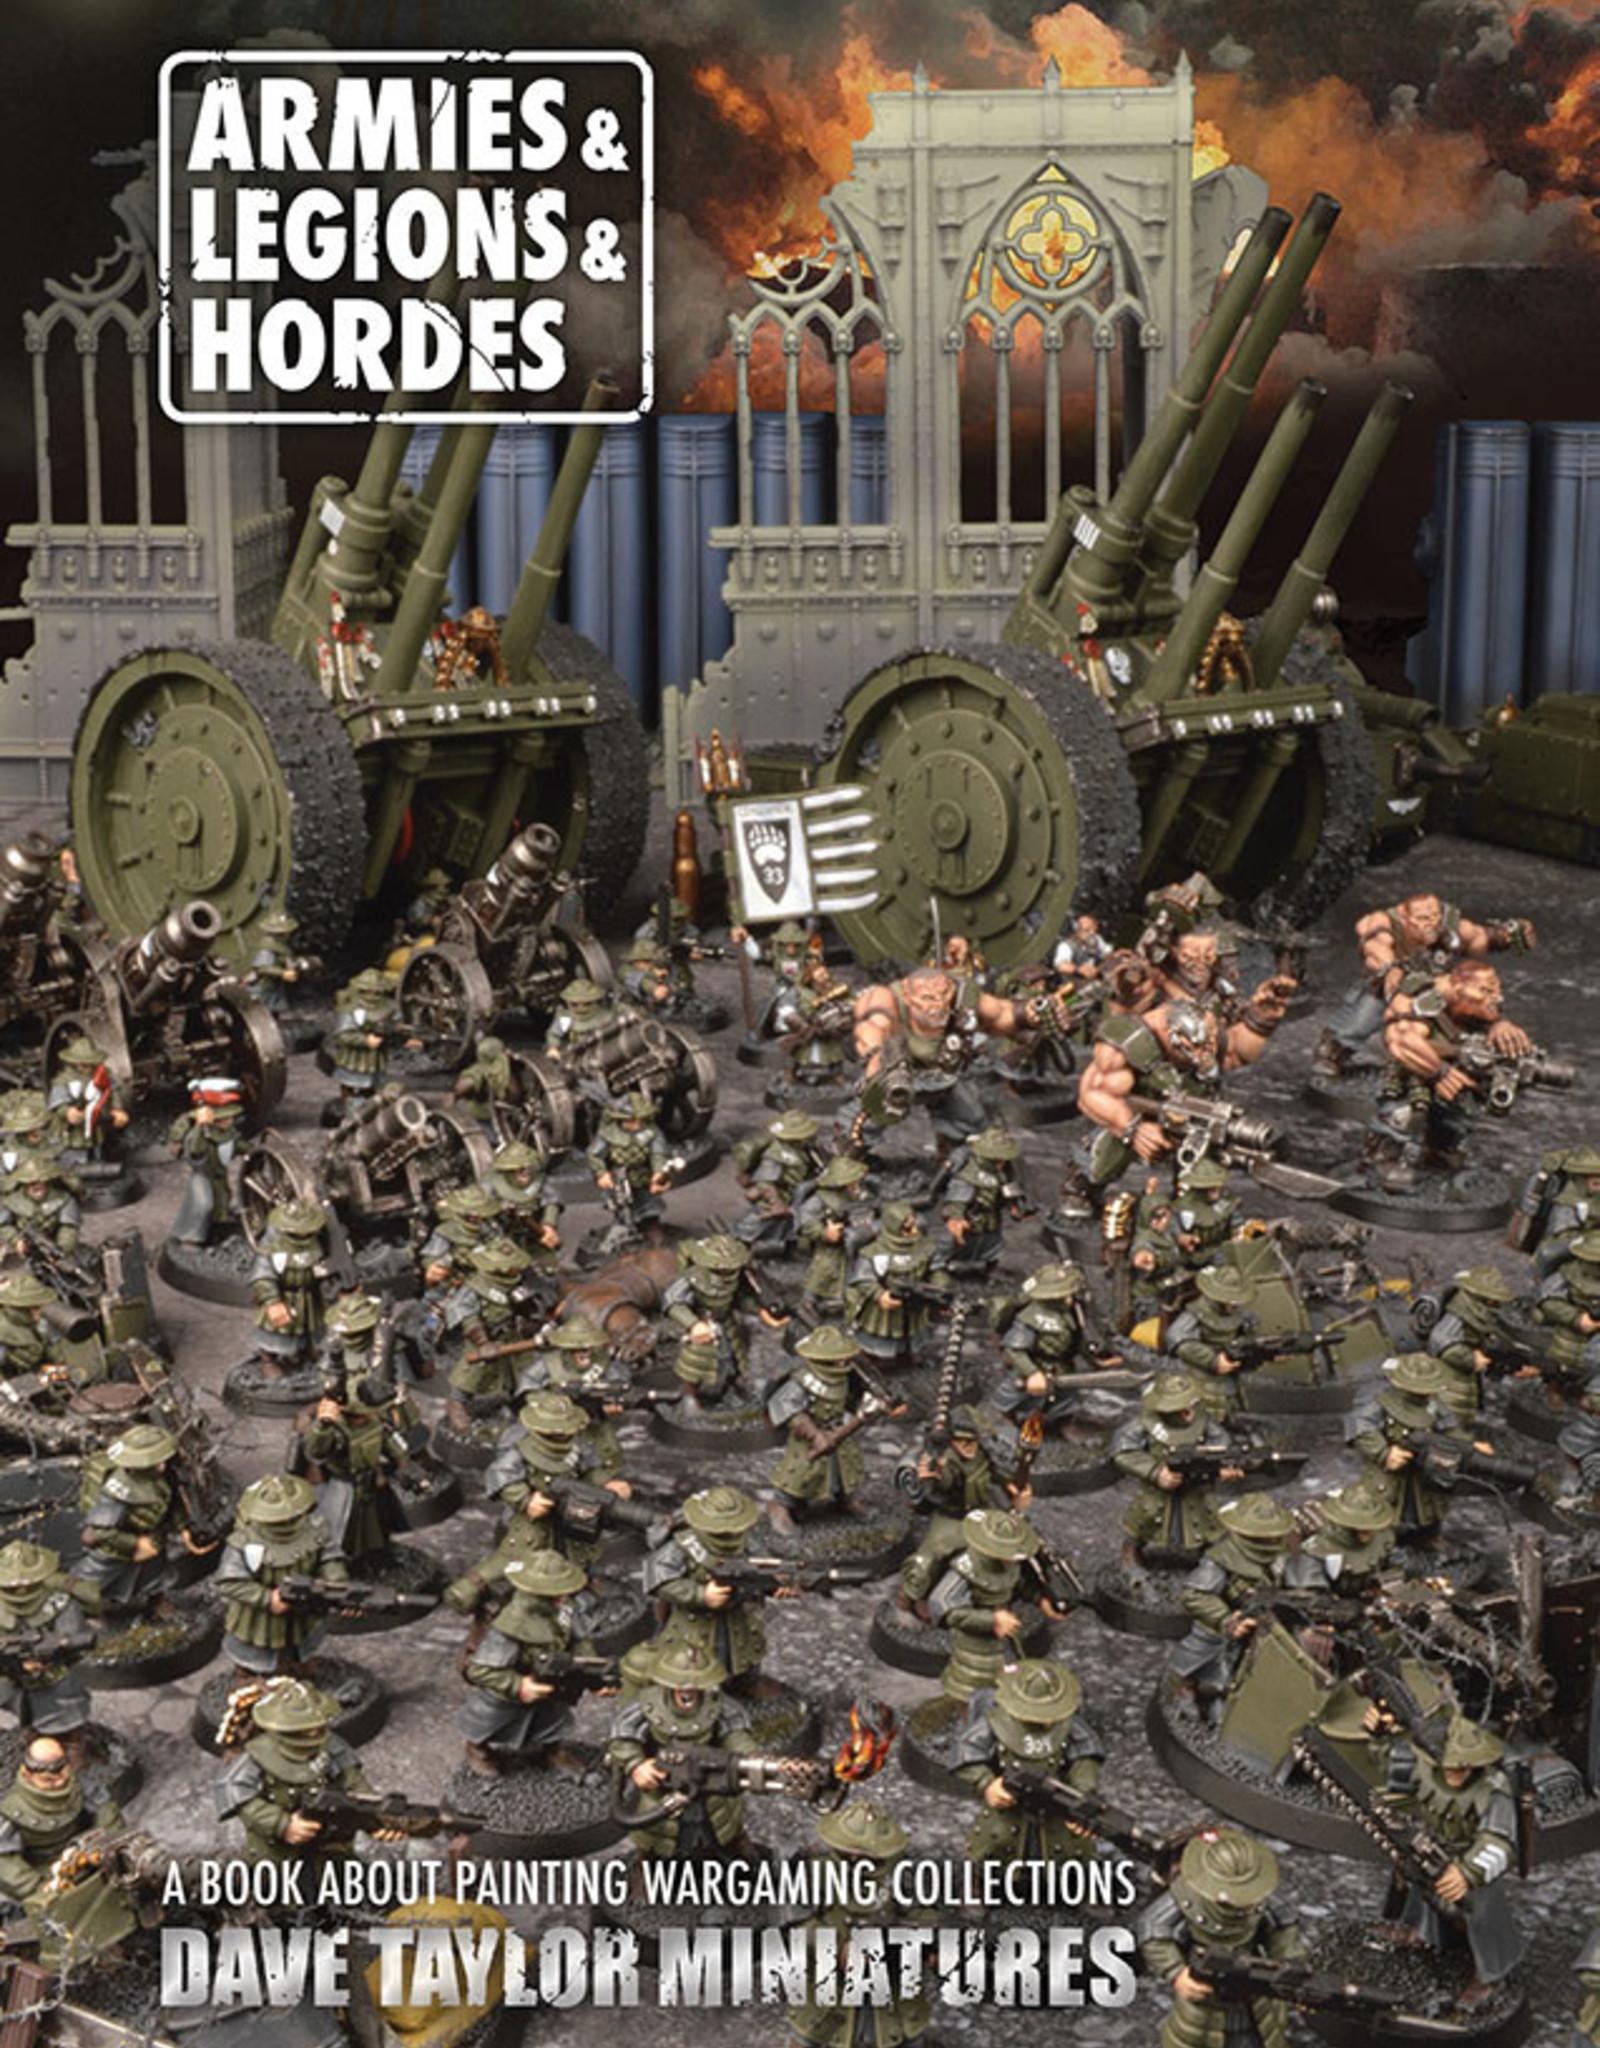 Dave Taylor Miniatures Armies & Legions & Hordes